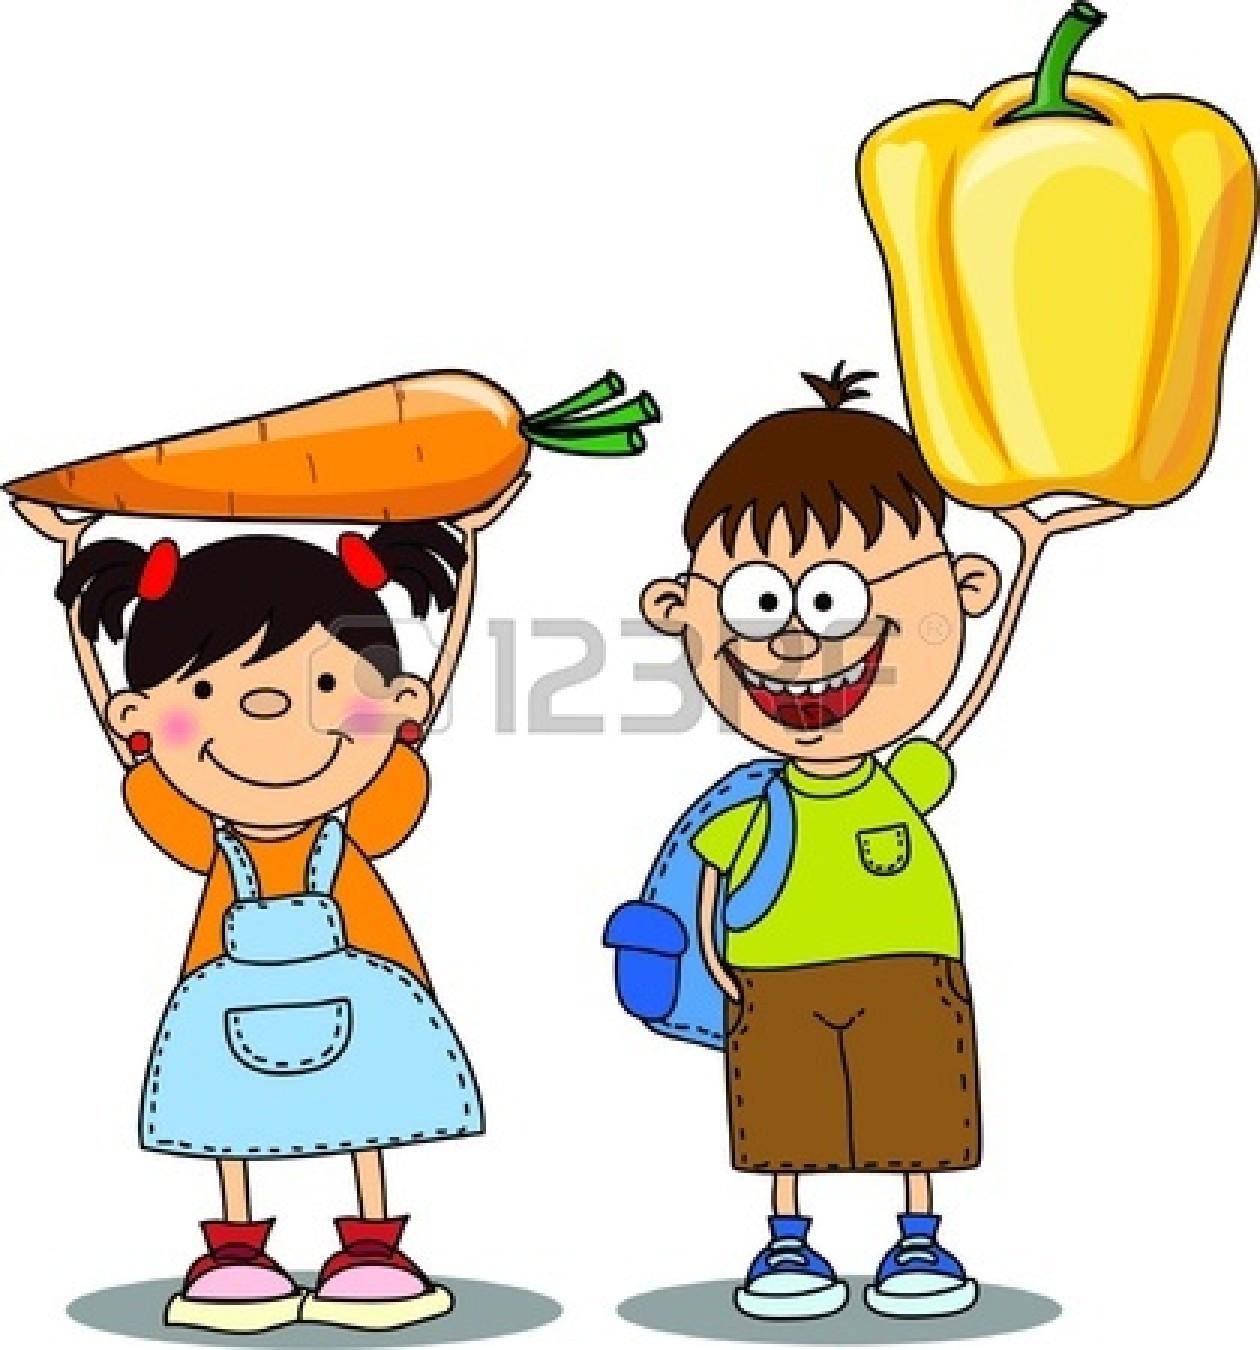 free clipart vegetables cartoon - photo #31